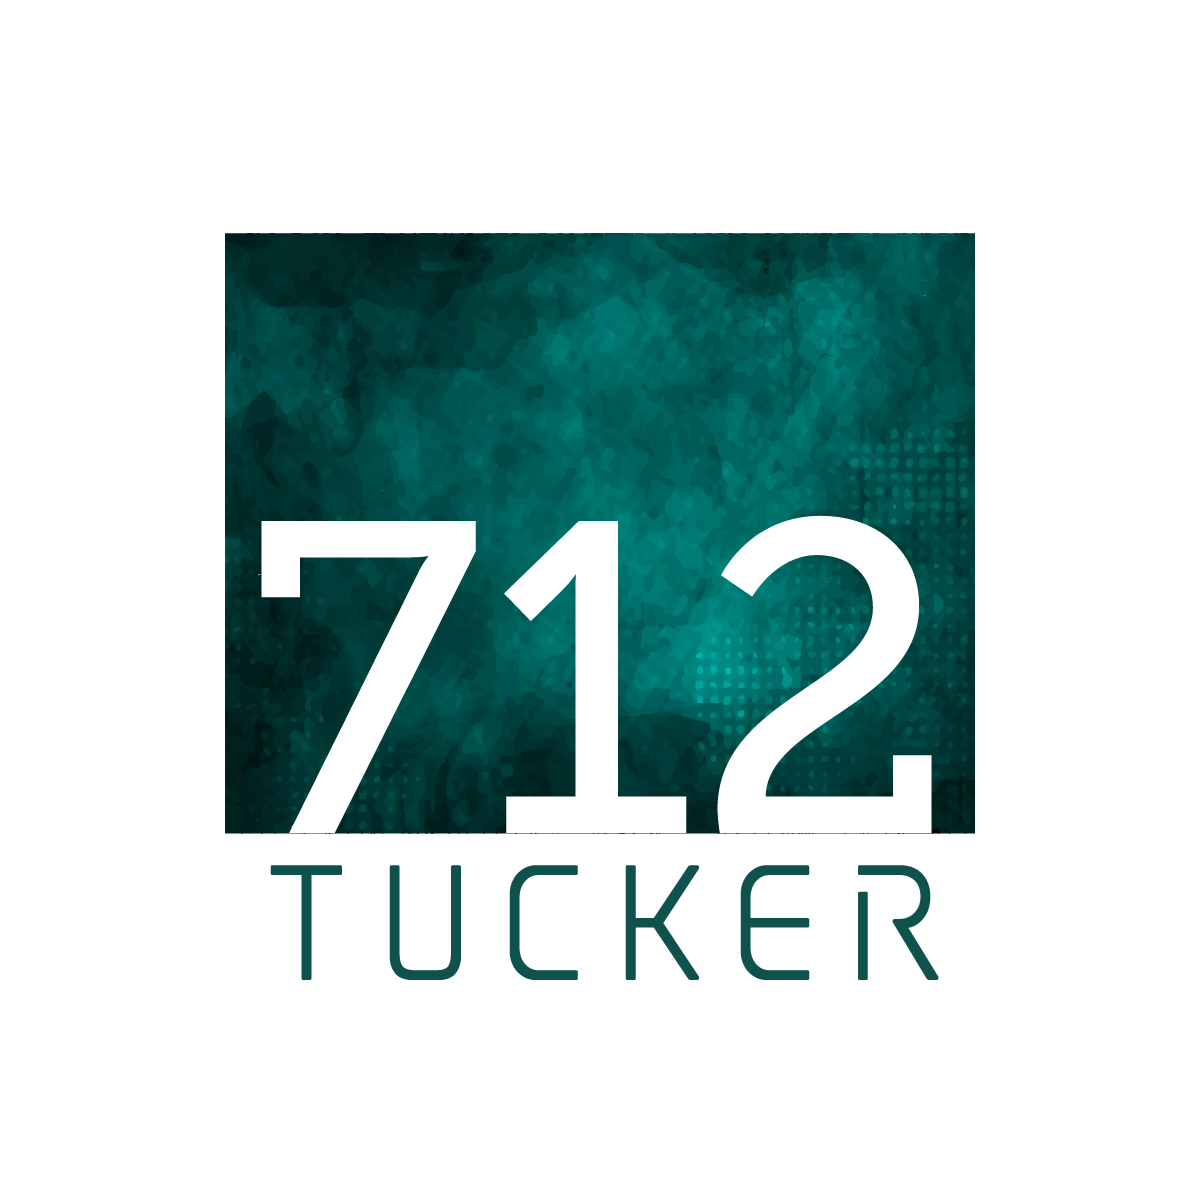 712 Tucker, Raleigh, NC